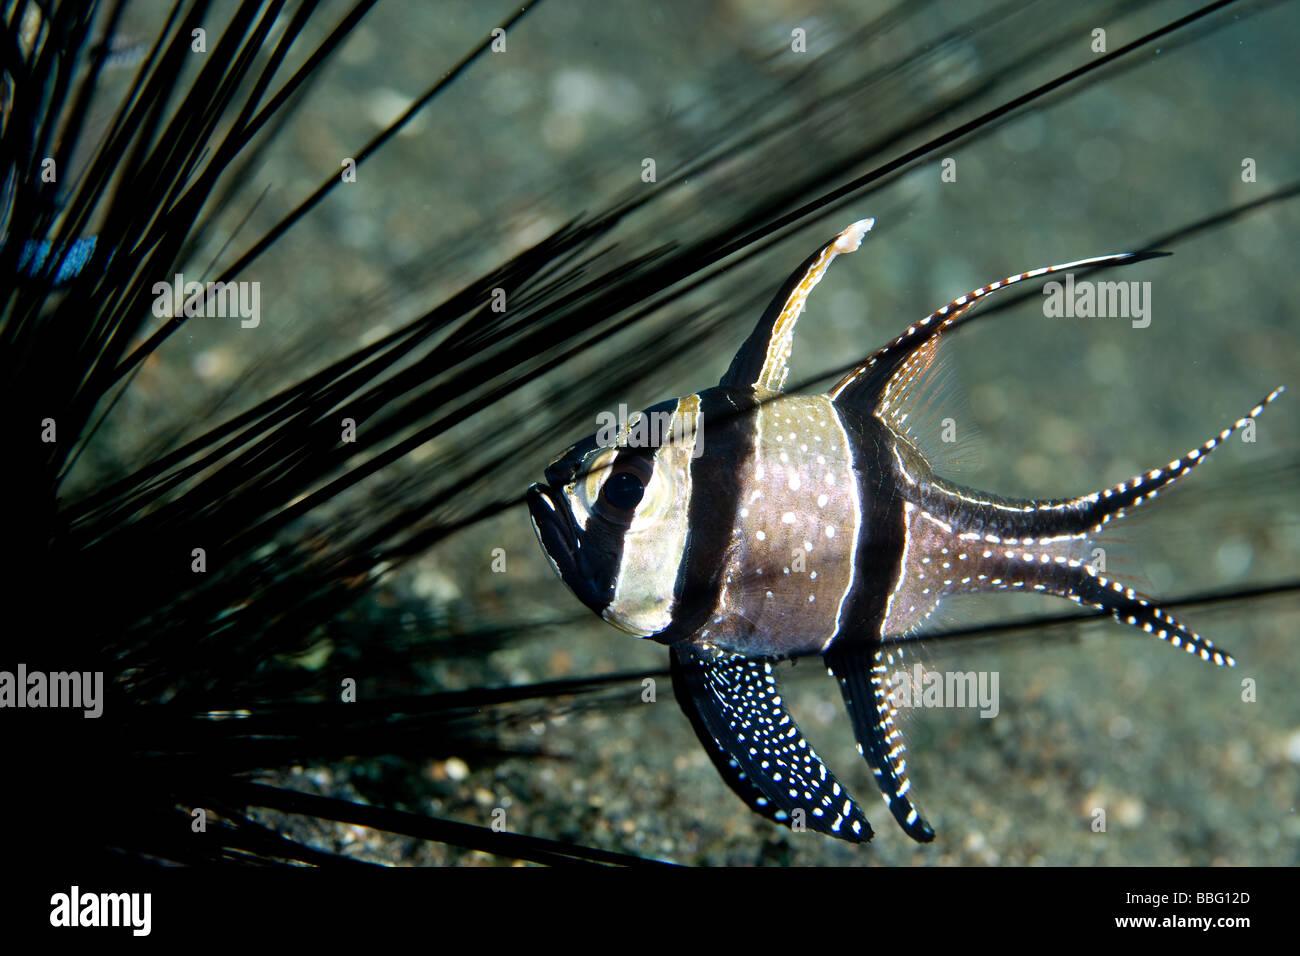 Cardinal fish and sea urchin. - Stock Image